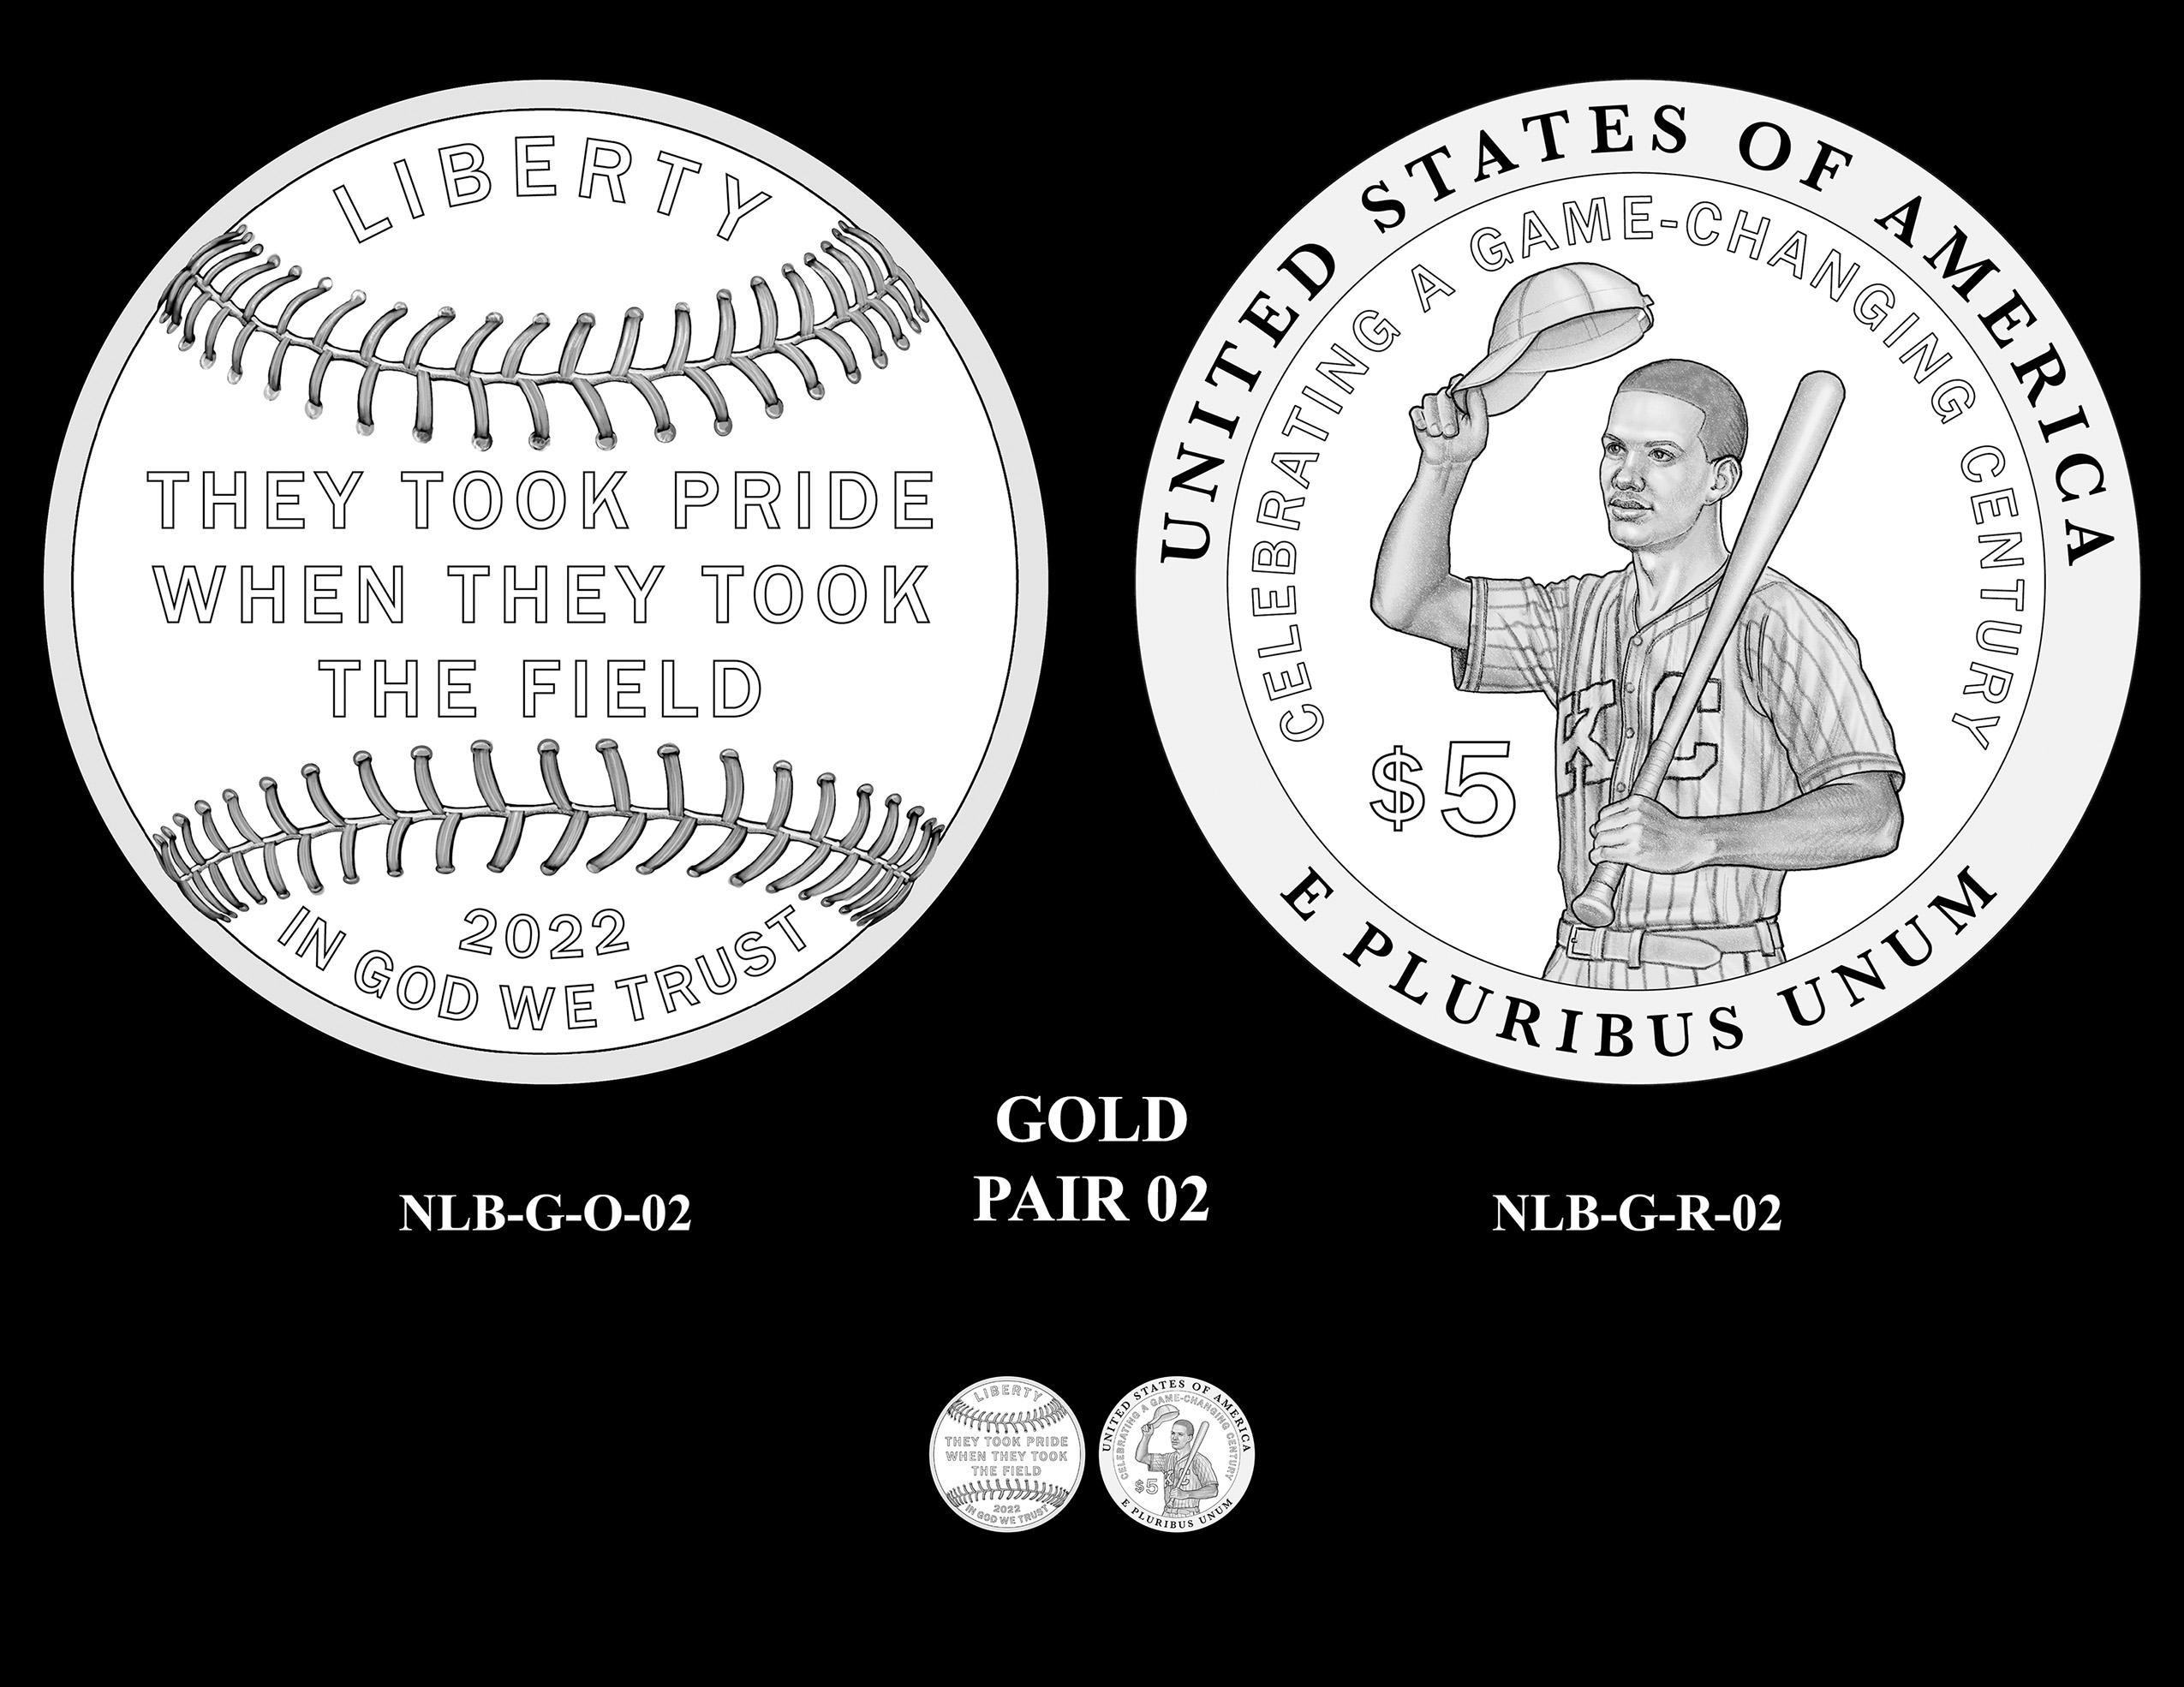 Gold Pair 02 -- Negro Leagues Baseball Commemorative Coin Program